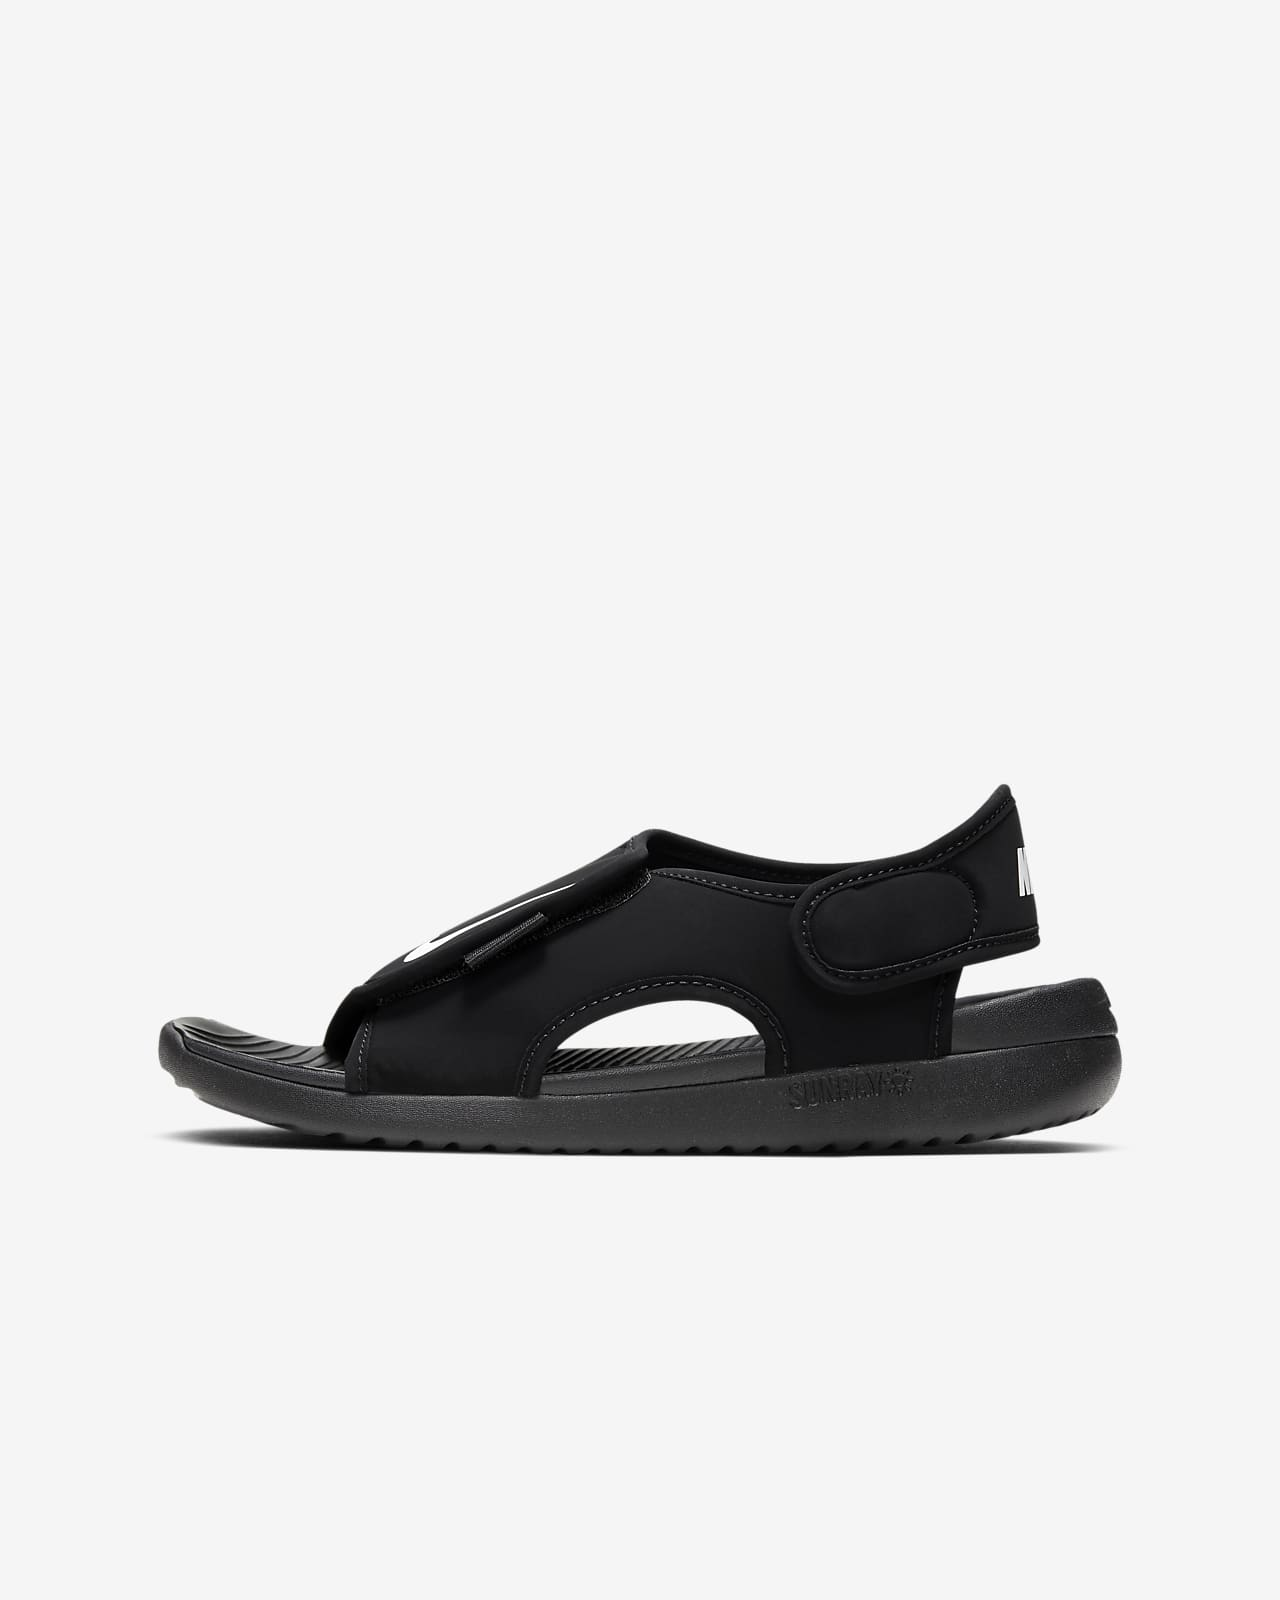 Nike Sunray Adjust 5 V2 Sandale für jüngere/ältere Kinder